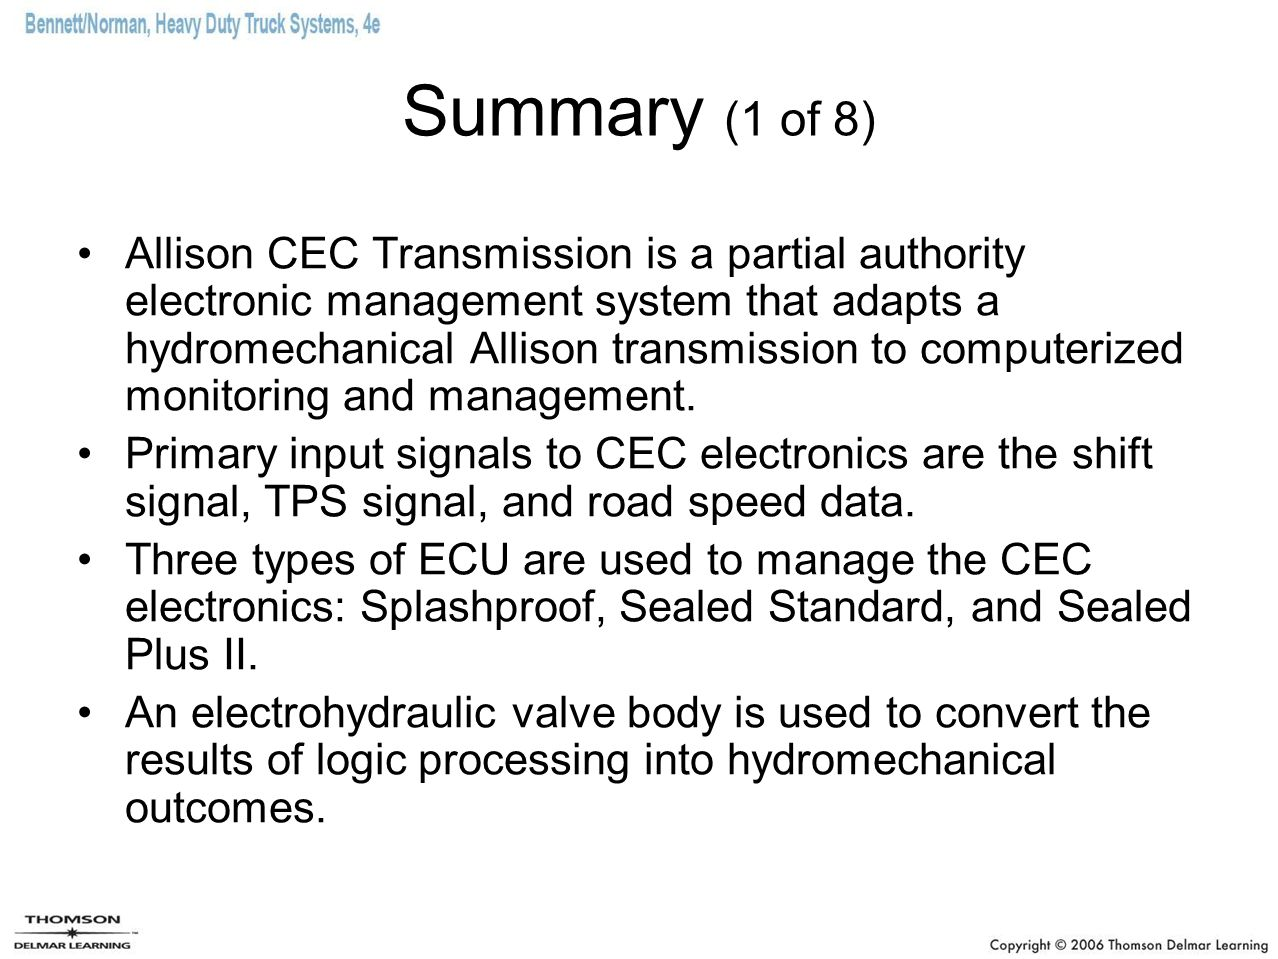 Allison Electronic Transmissions - ppt download